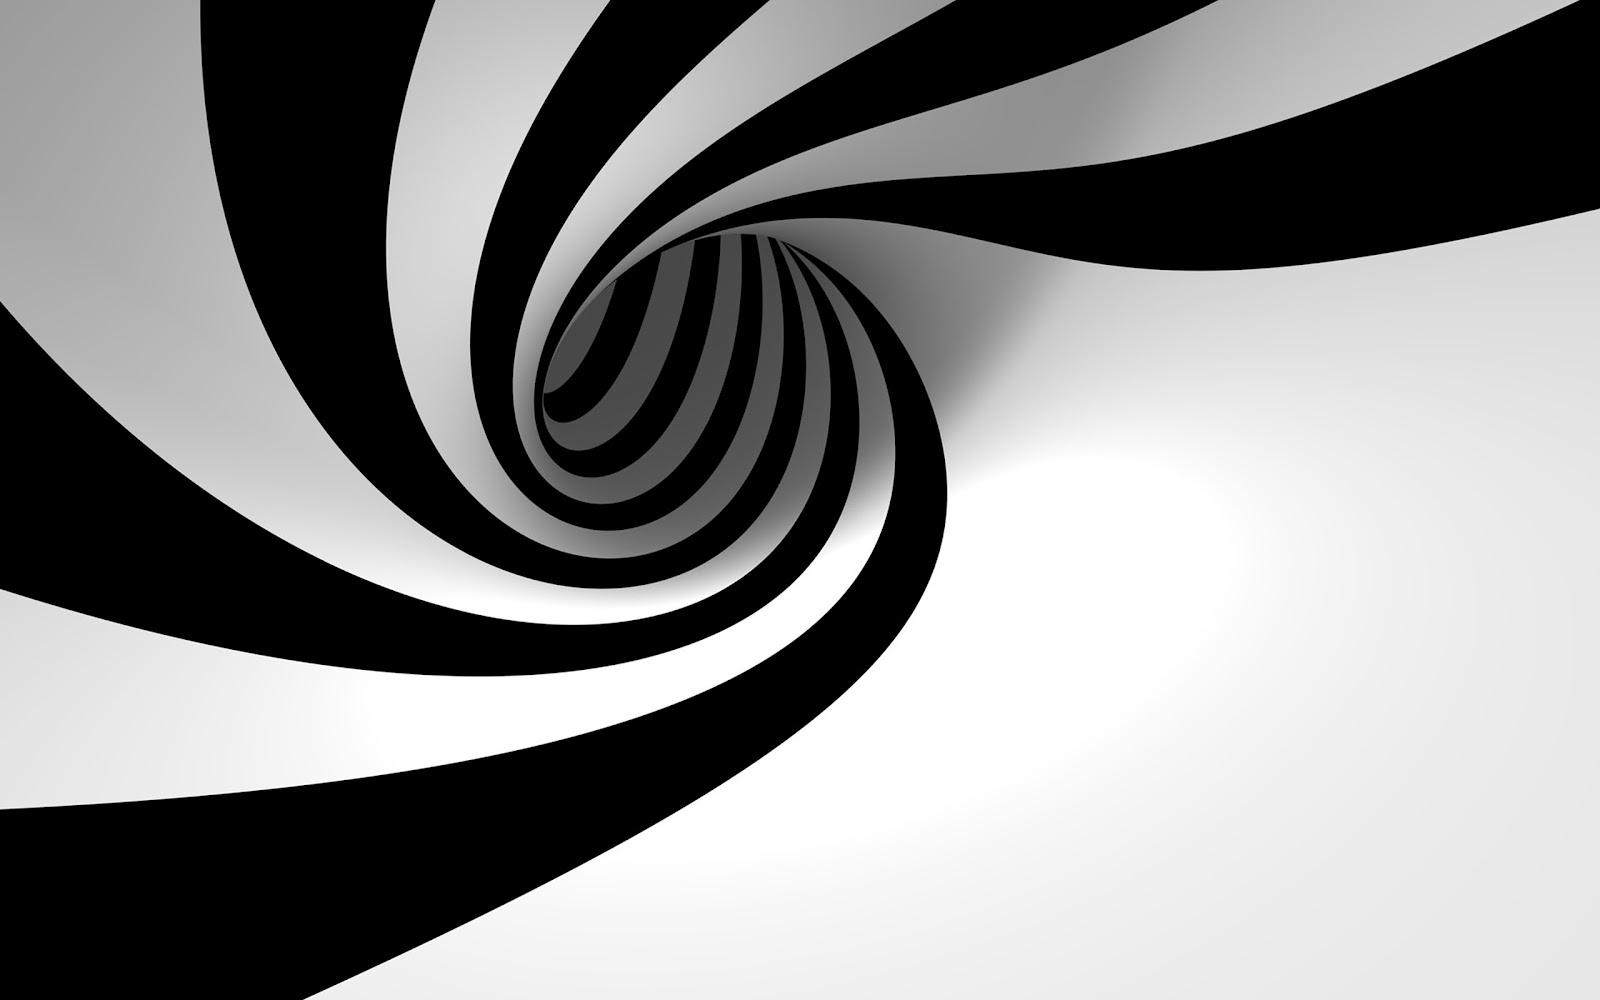 Free Desktop Wallpaper: White Abstract Wallpaper